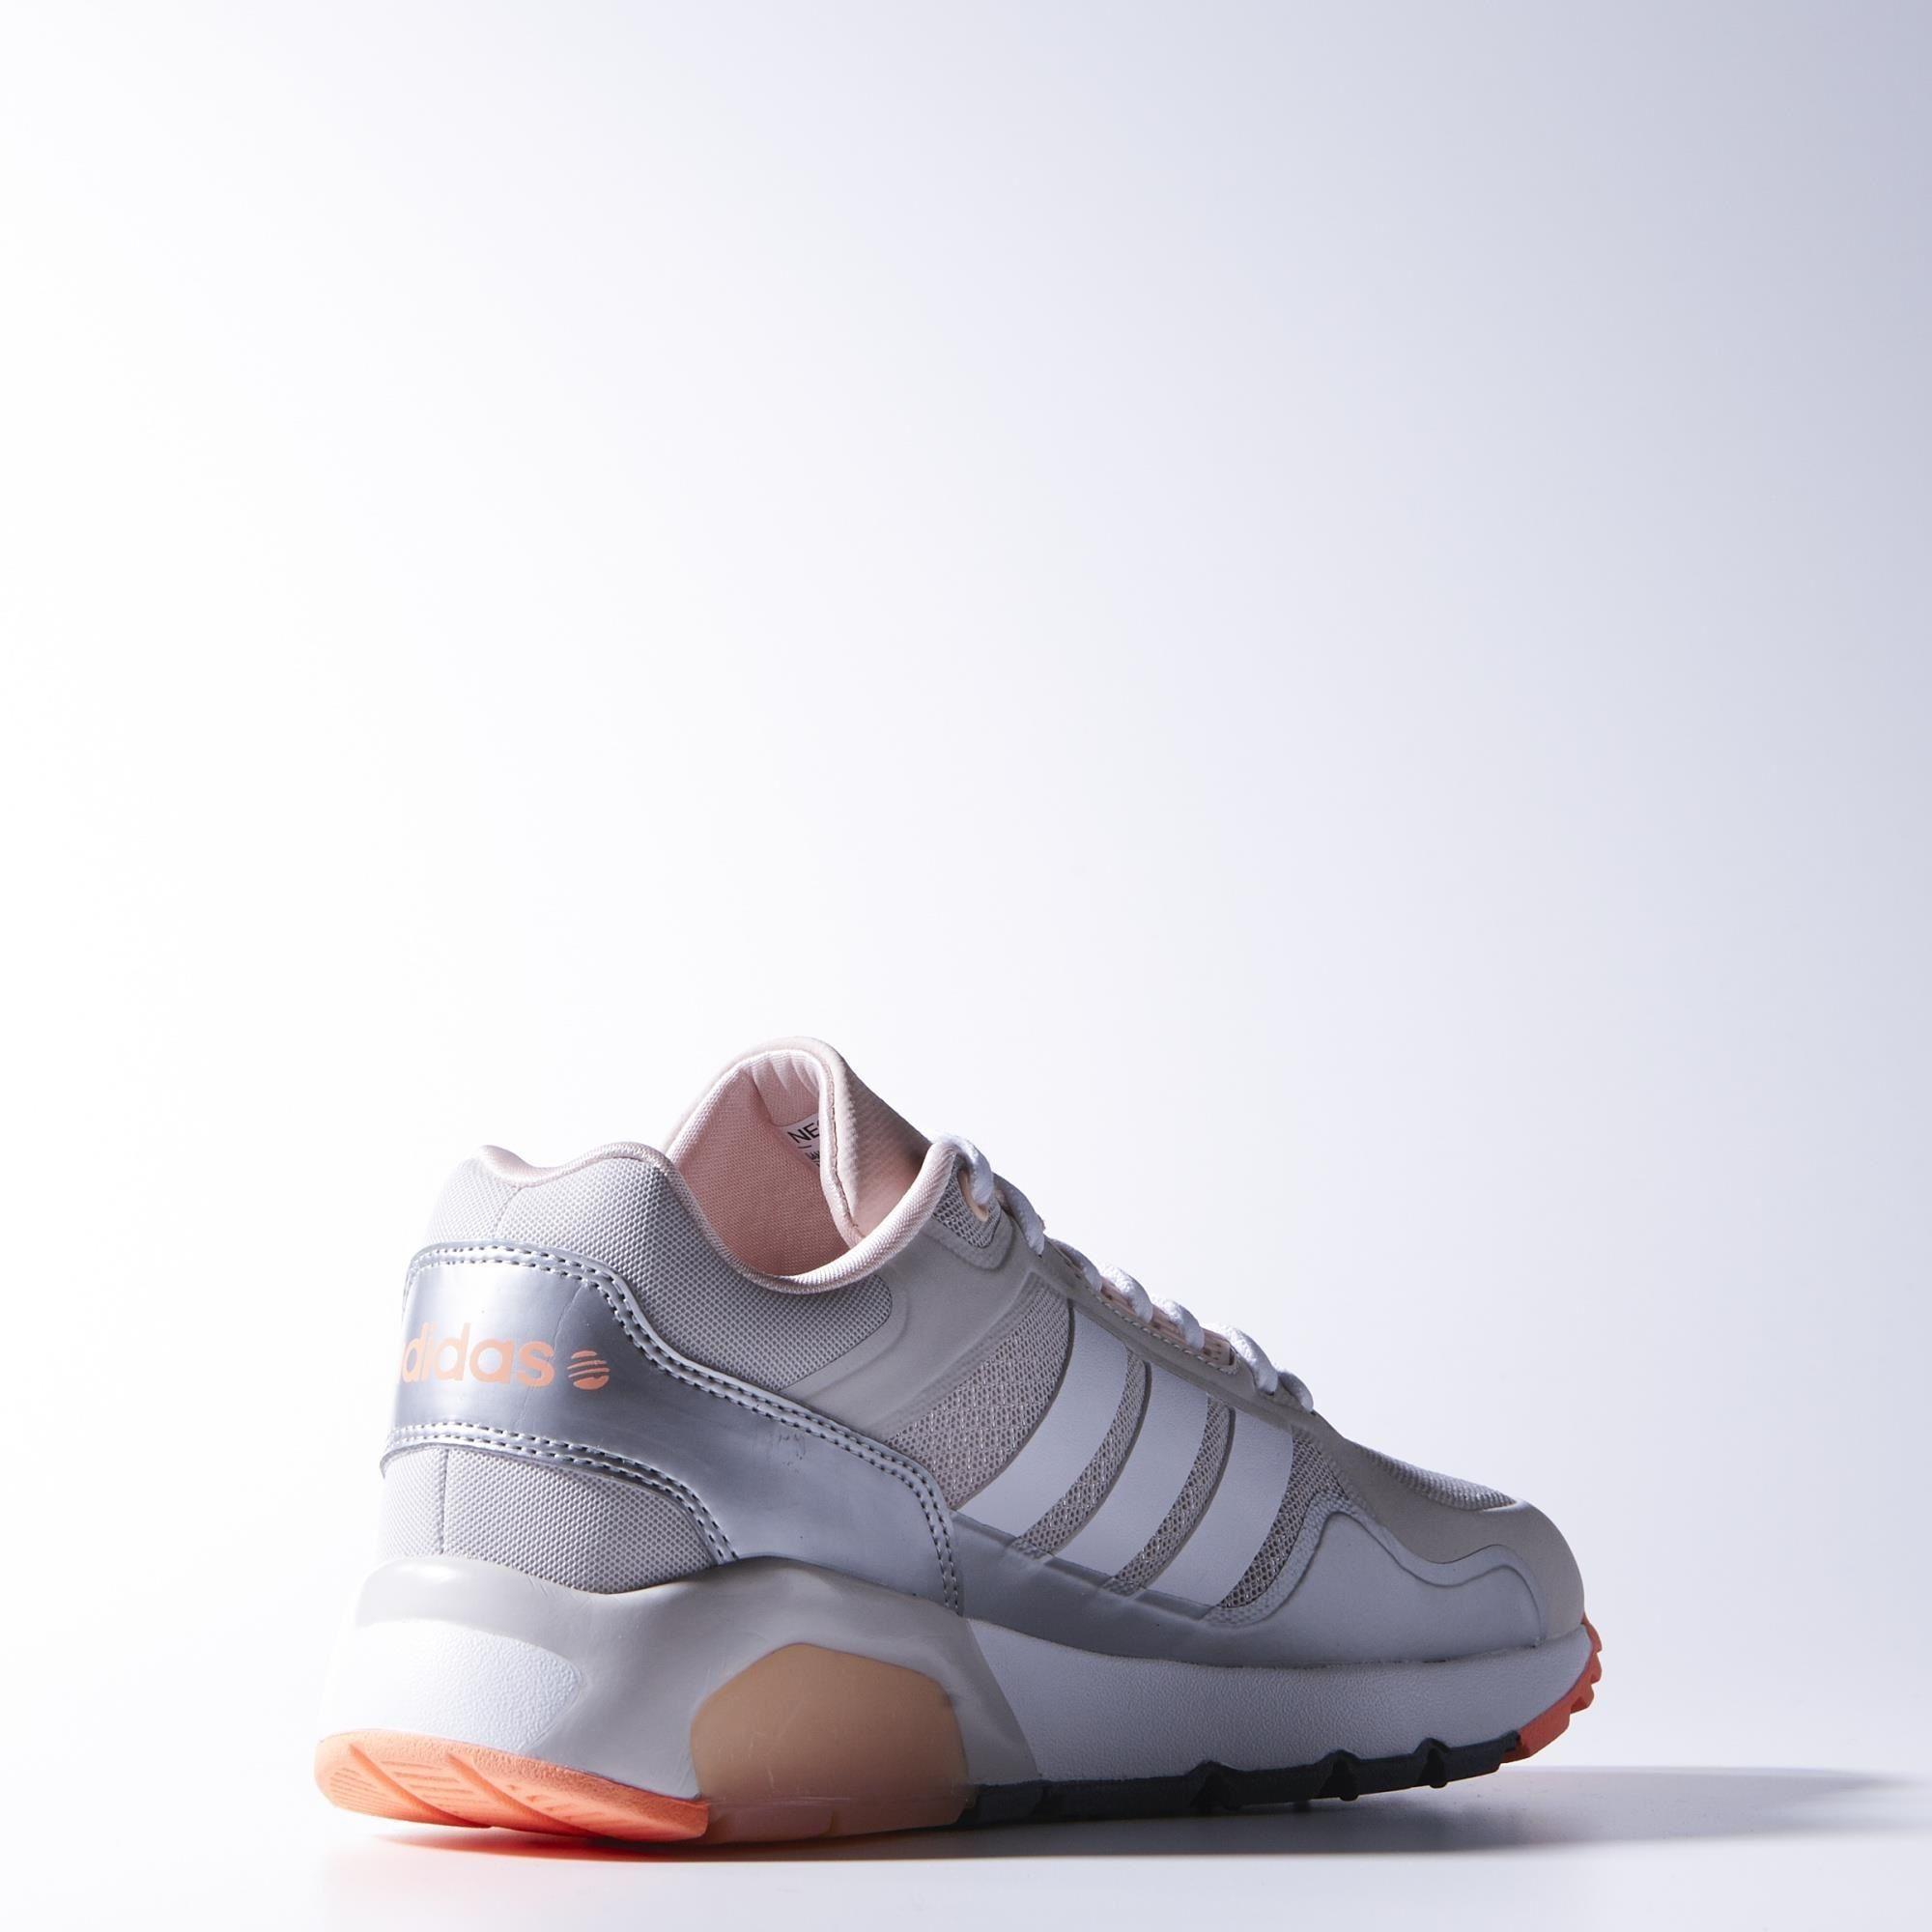 adidas Selena Gomez RUN90s TM sko   Sko, Sneakers nike